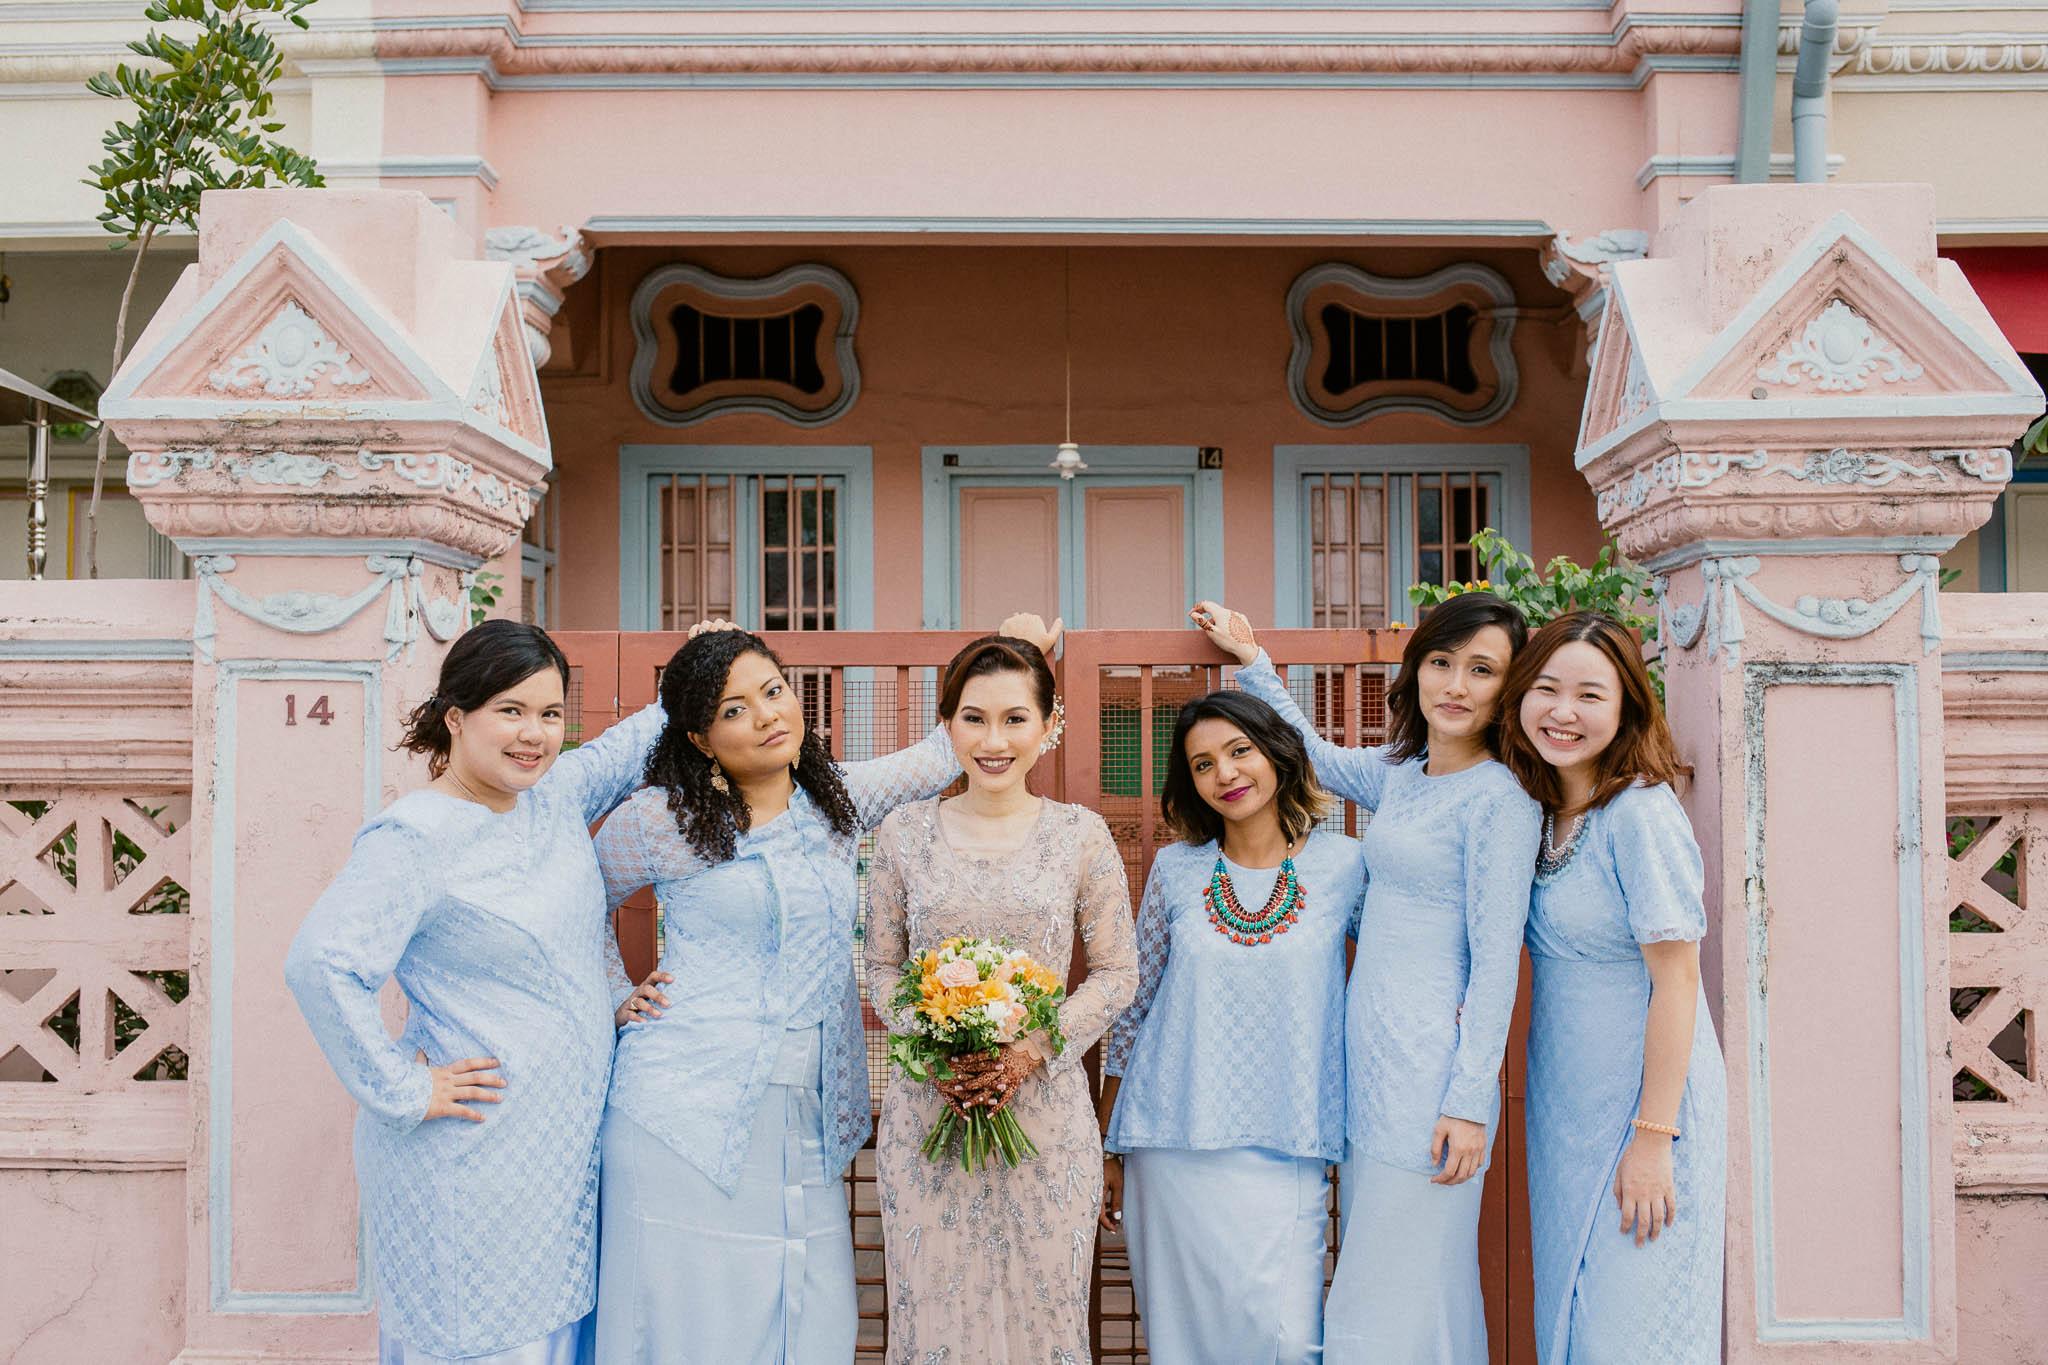 singapore-wedding-photographer-addafiq-nufail-072.jpg